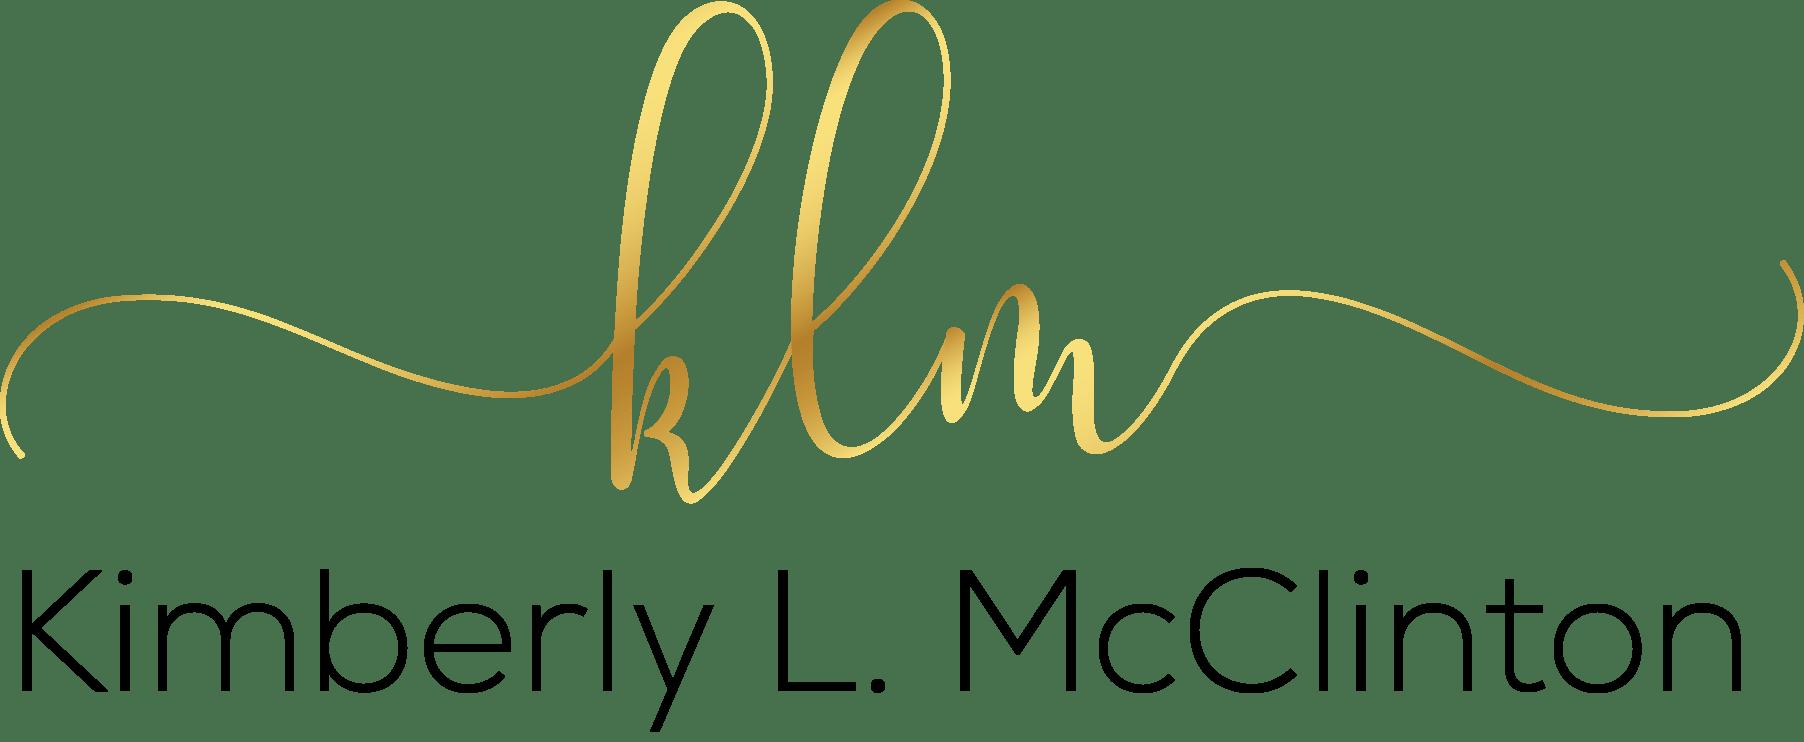 Kimberly L. McClinton